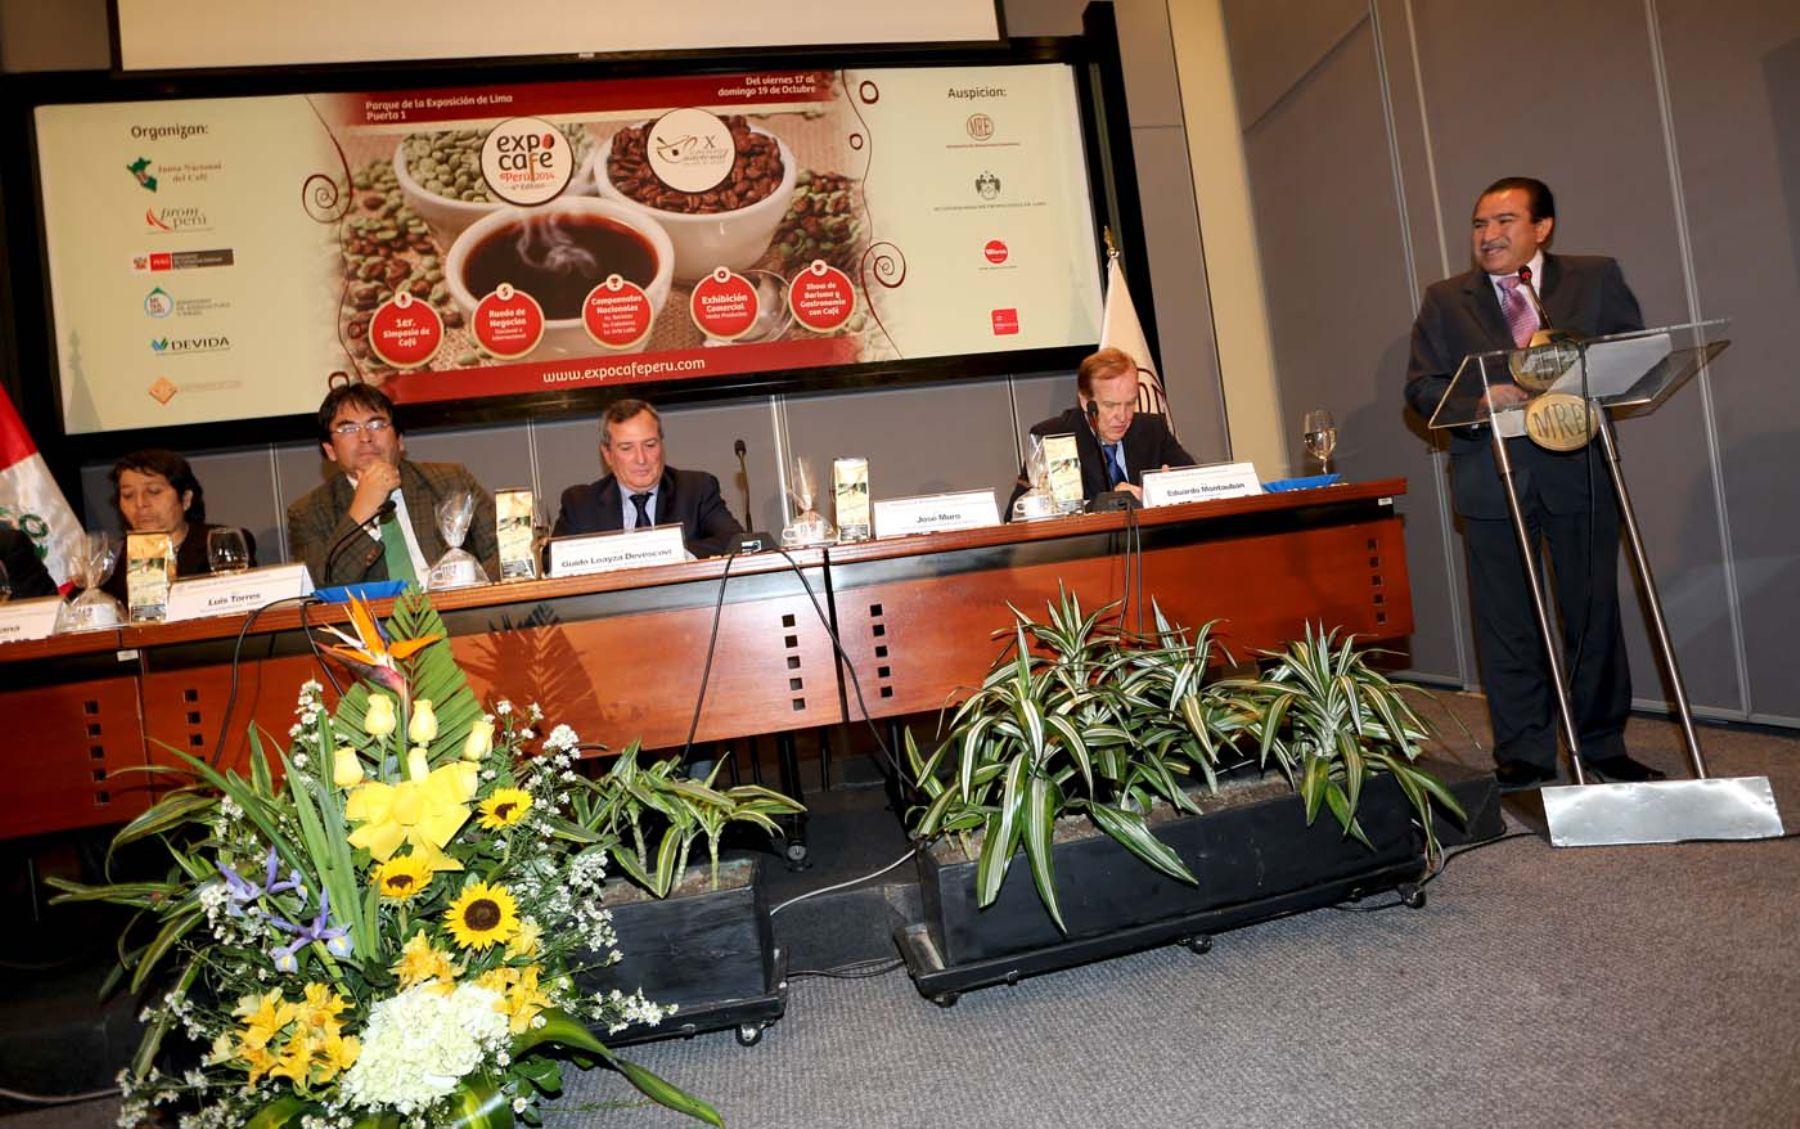 presentación de Expocafé 2014.